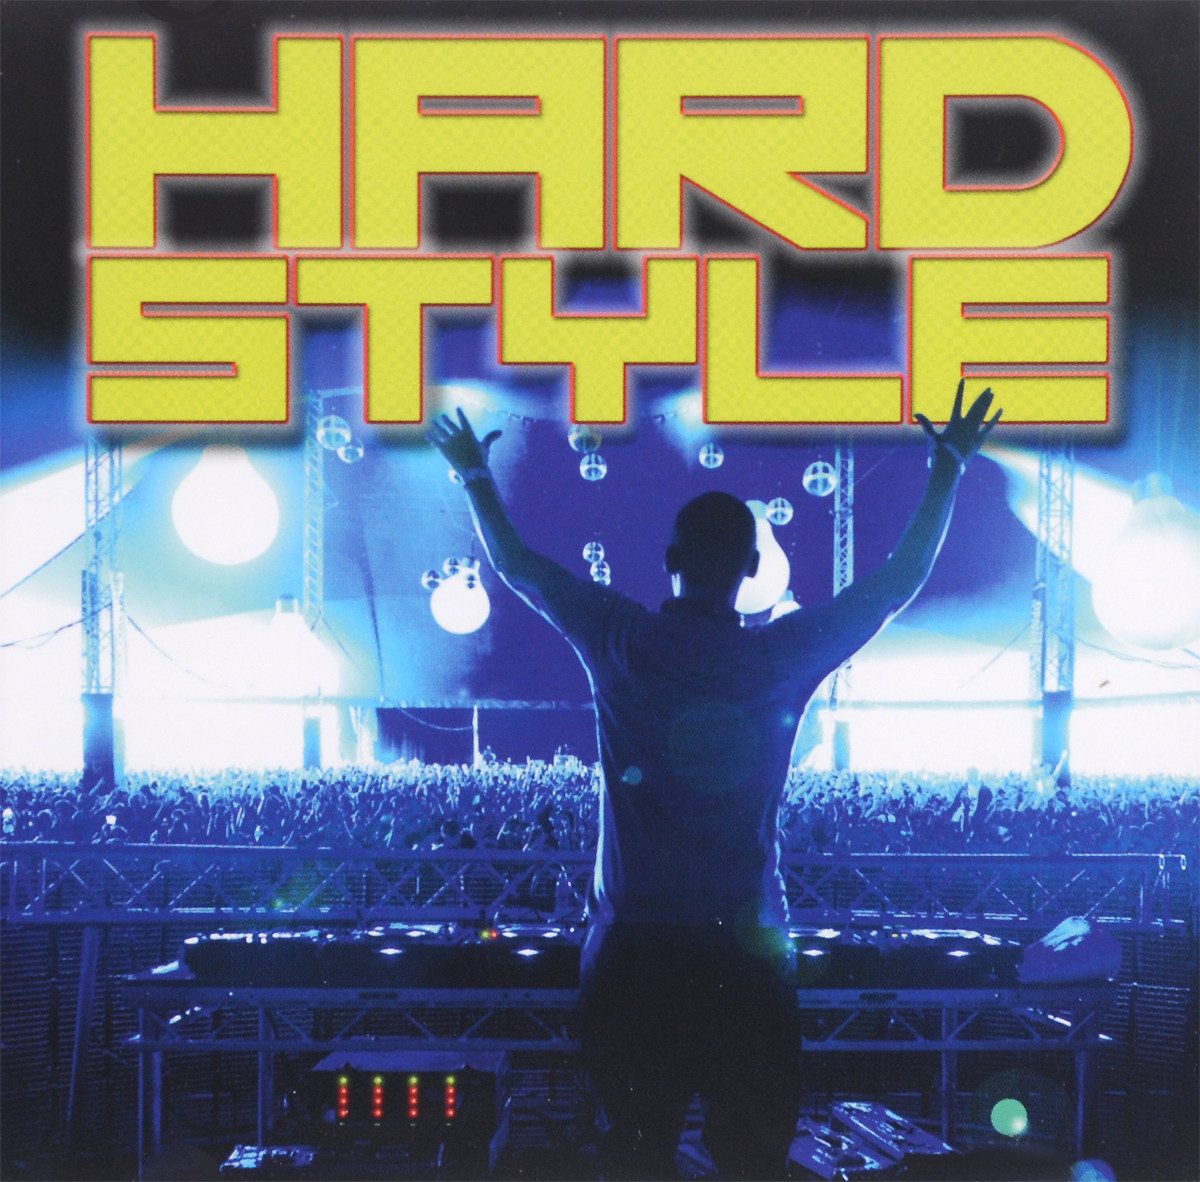 Sam Punk,The Divider,Darksiderz,Overdr1veZ,Silver Nikan Presents Hardbangerz,Brooklyn Bounce,DJ Spear,Caffeine,DJ Trooper,Pyrotense,Topstyle MC,Pulsatorz,DJ Zealot,Ben Passion,Ukrainian Hardstylerz,MC Rebel Hardstyle (2 CD) dj lbr mc shurakano dj lbr feat mc shurakano u got it maxi single lp